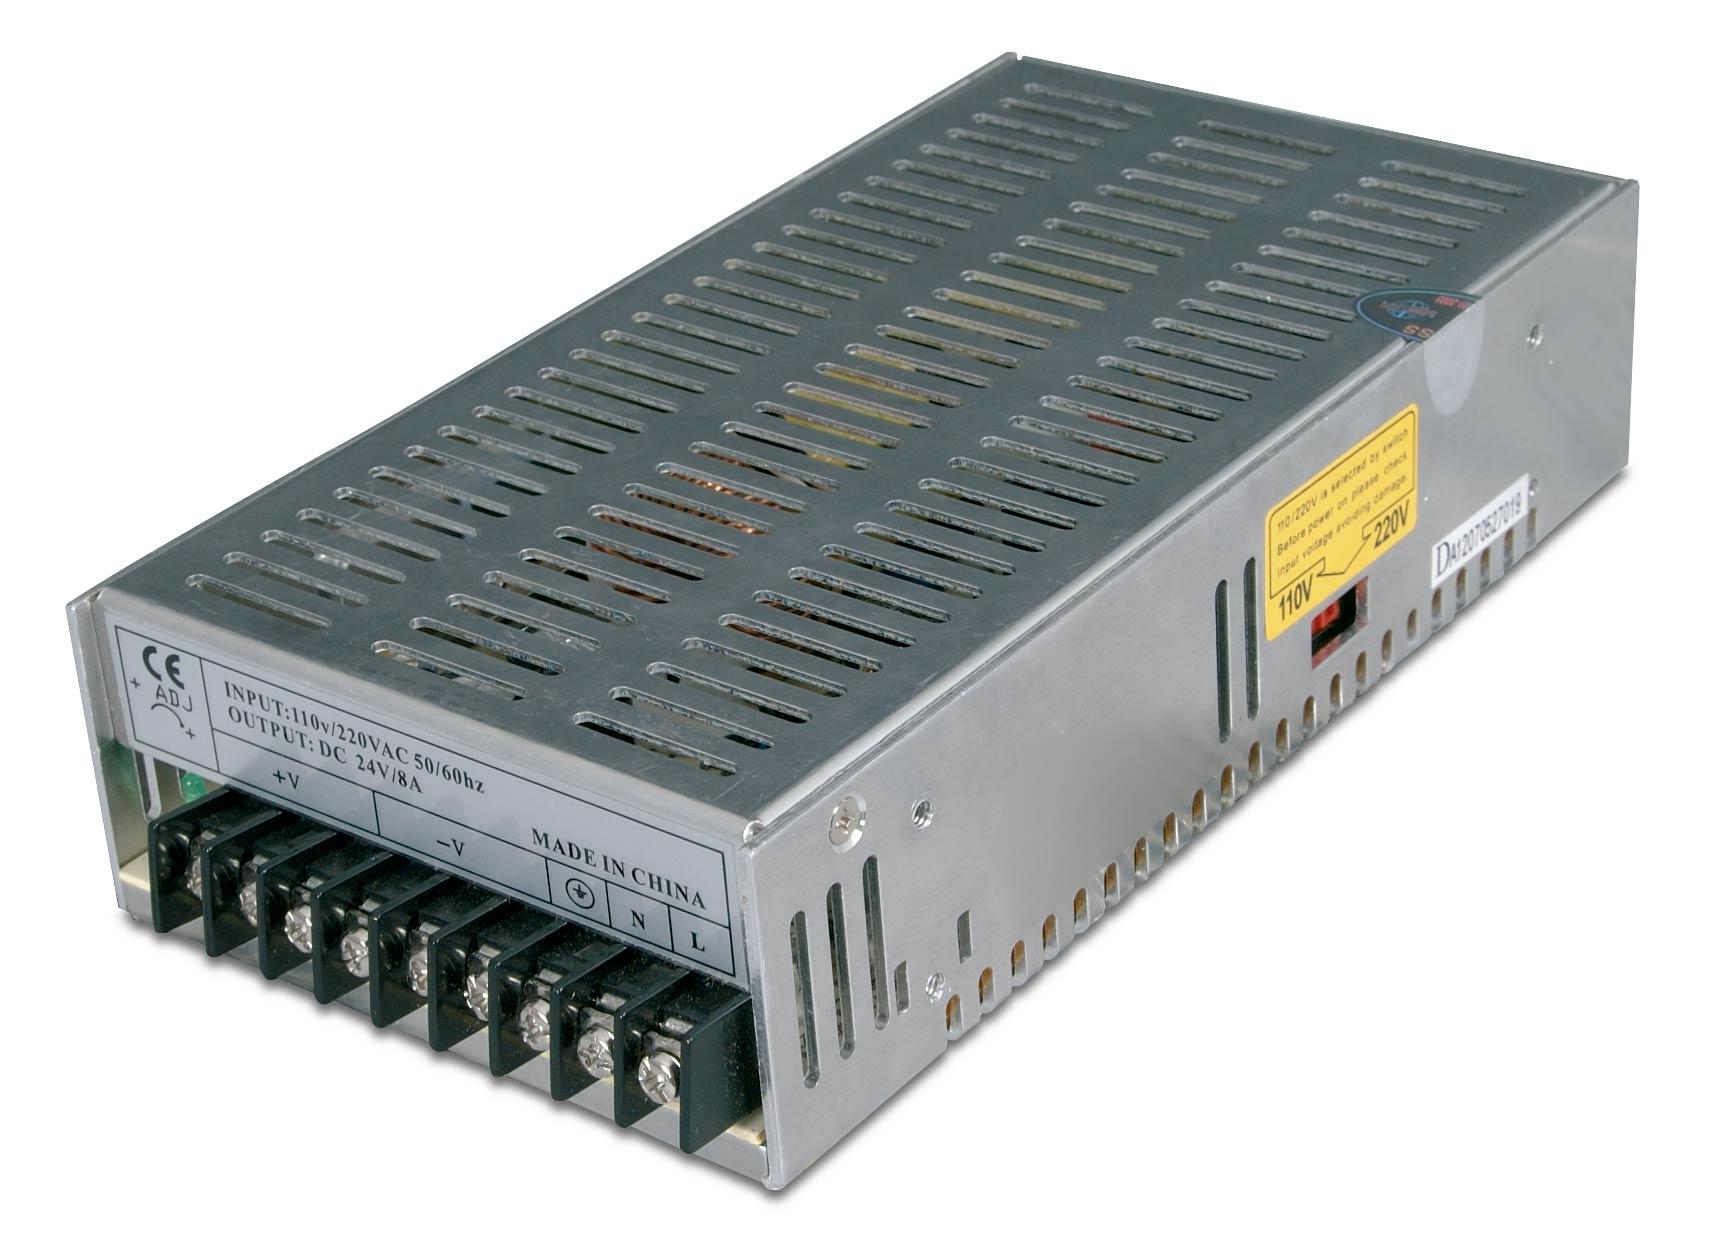 SP-200-24